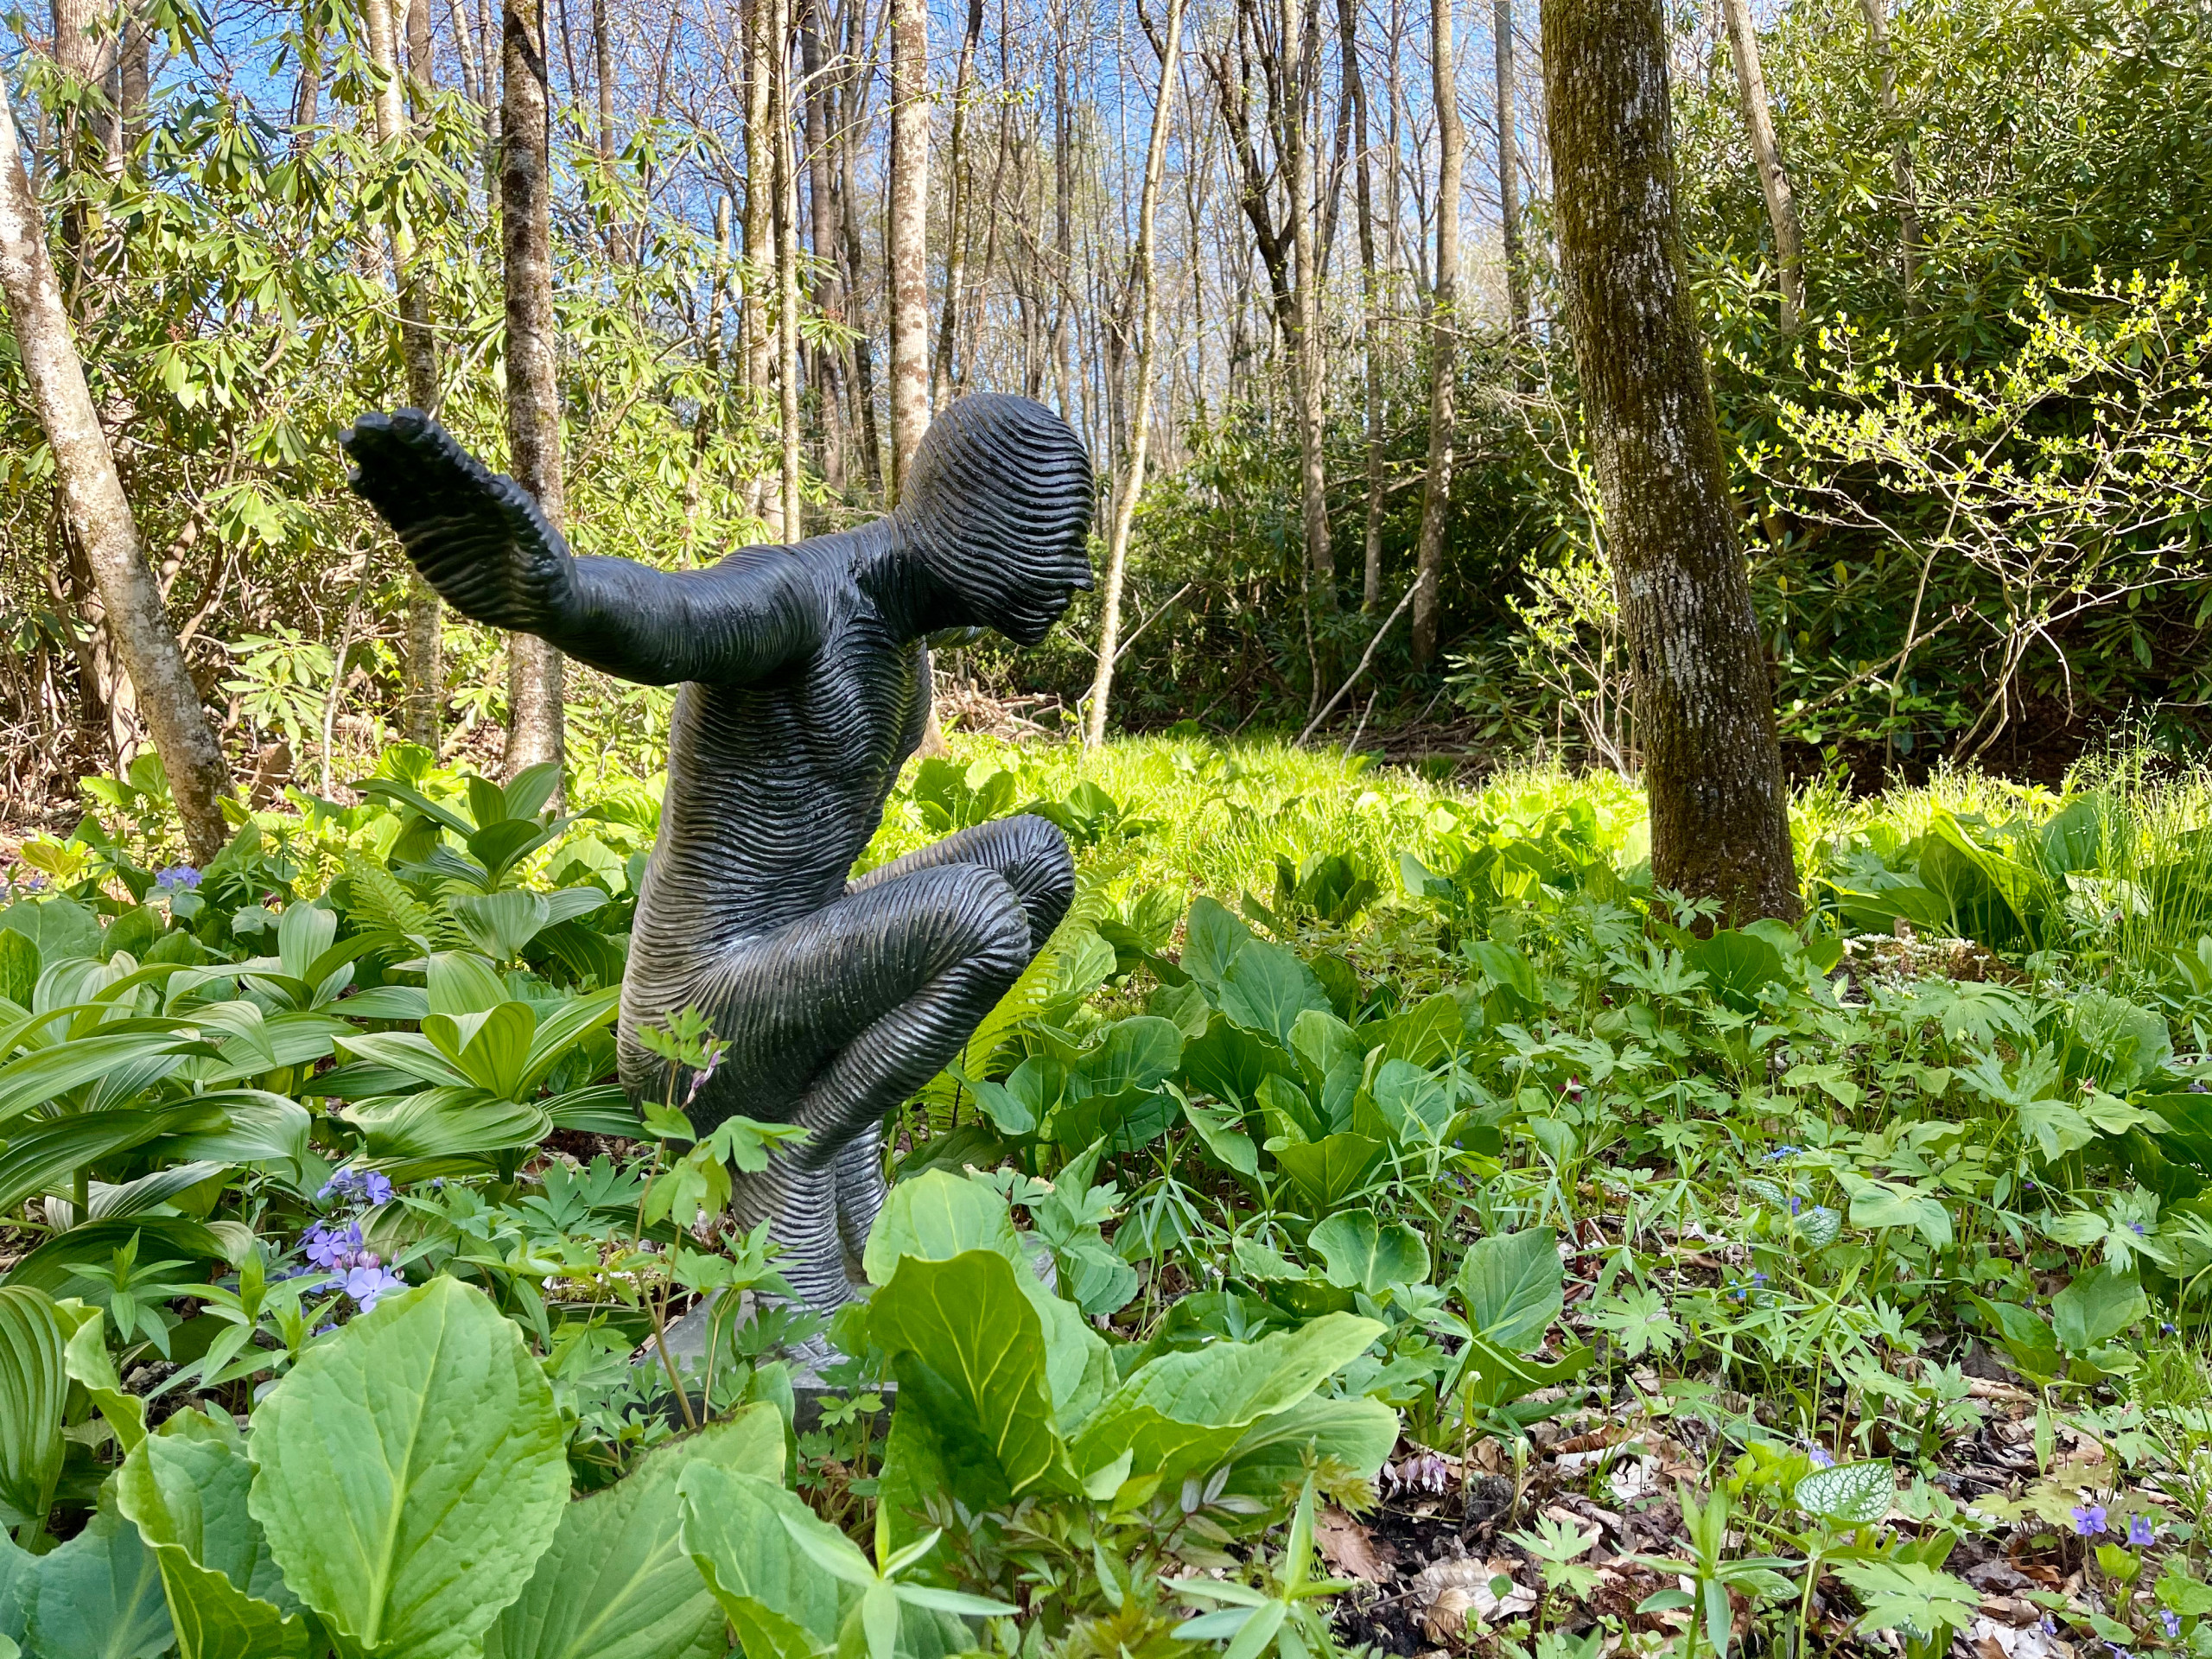 Sculpture in Bog #1